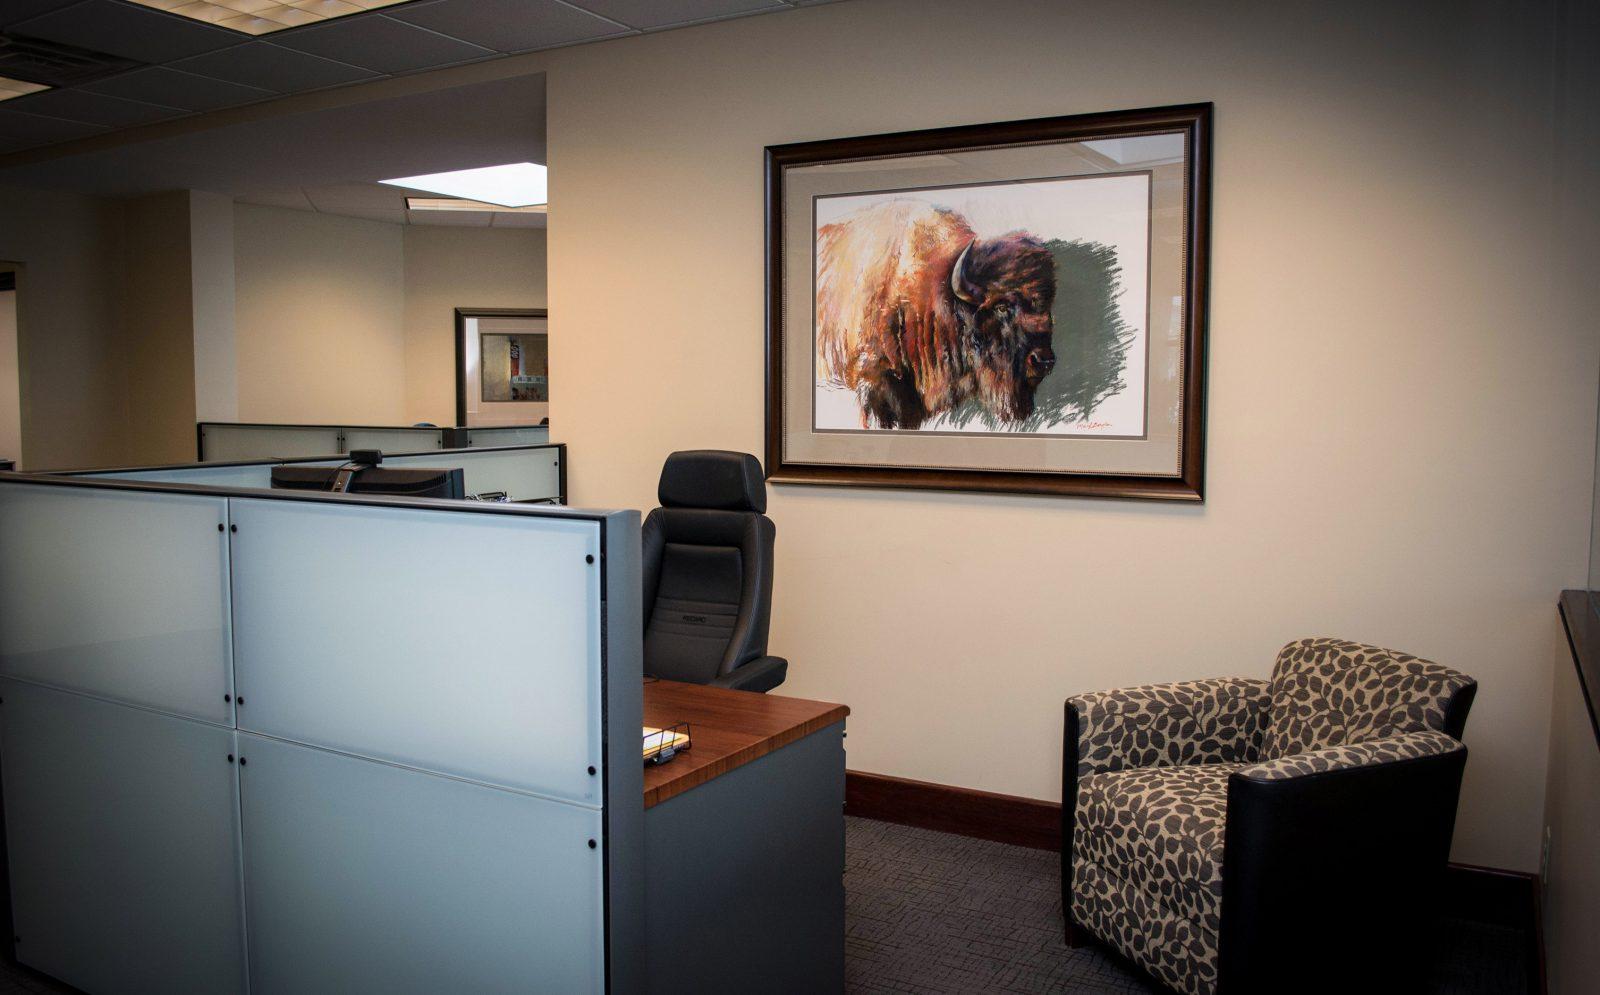 framed buffalo artwork on the wall of an office